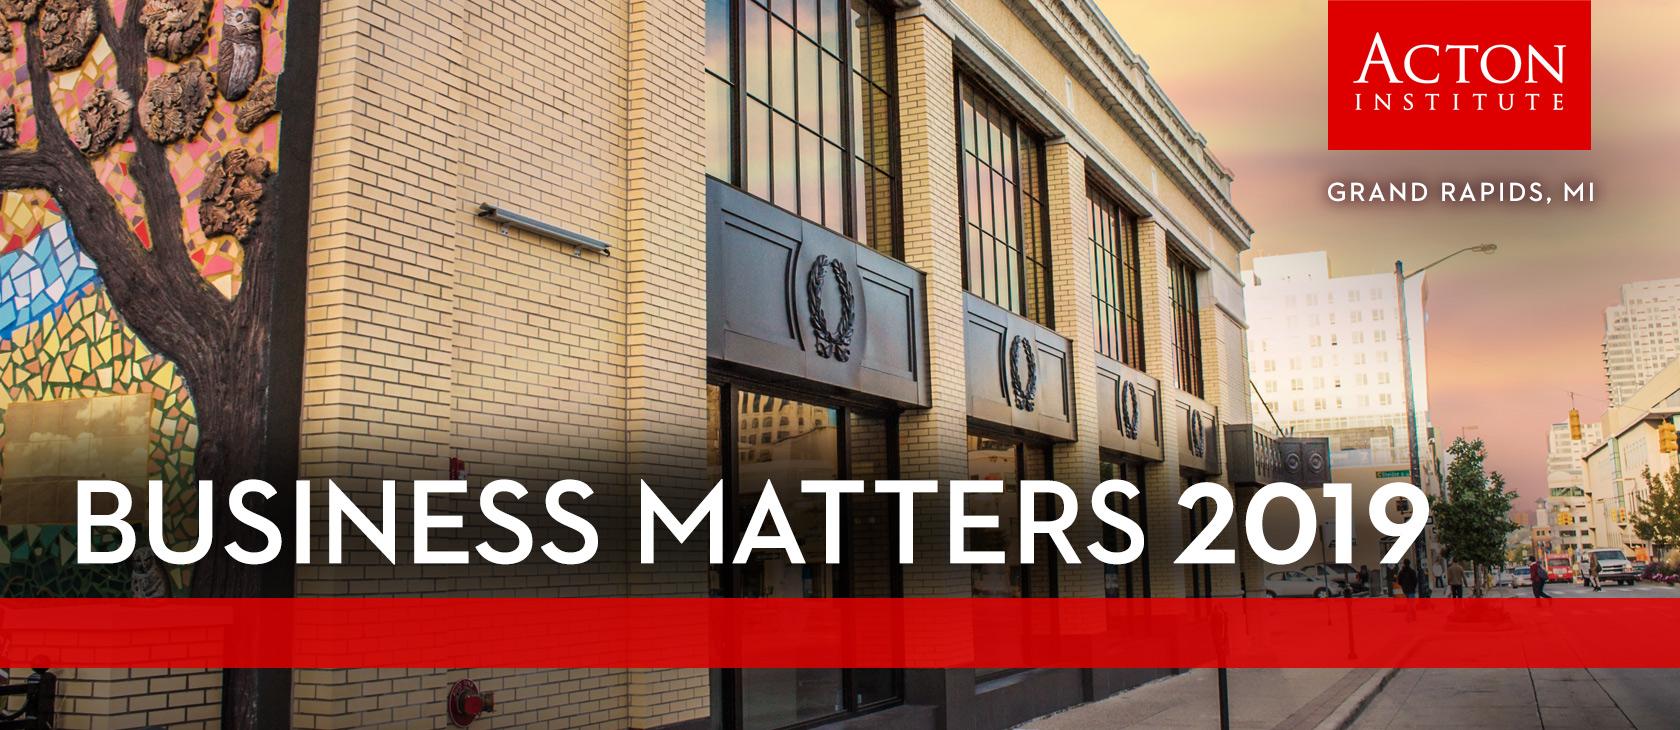 Business Matters 2019